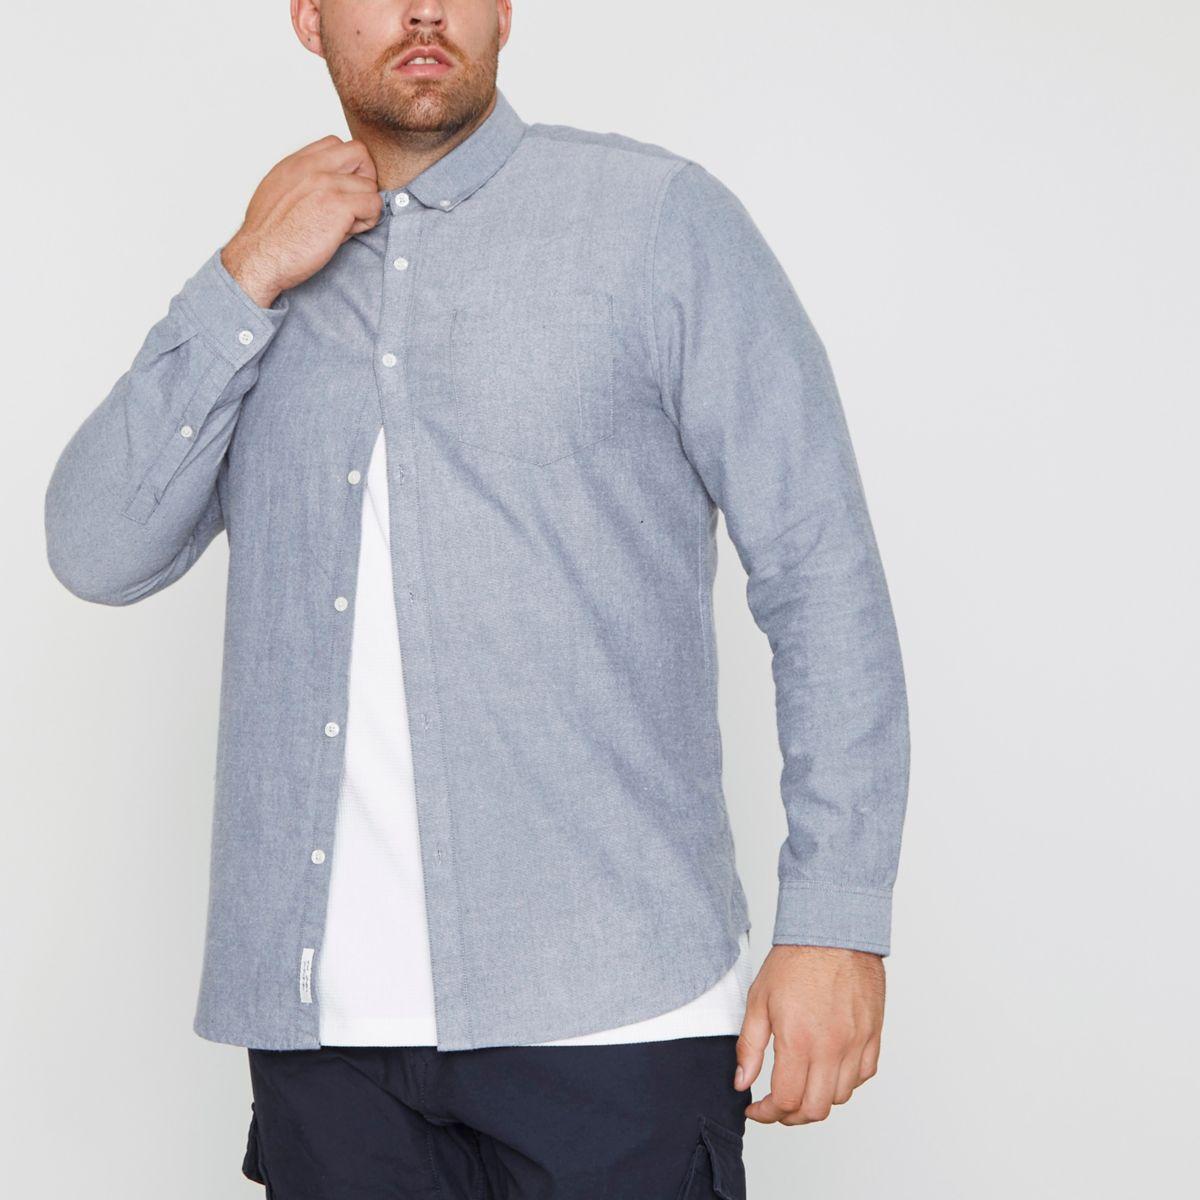 RI Big and Tall - Lichtblauw Oxford geborsteld overhemd